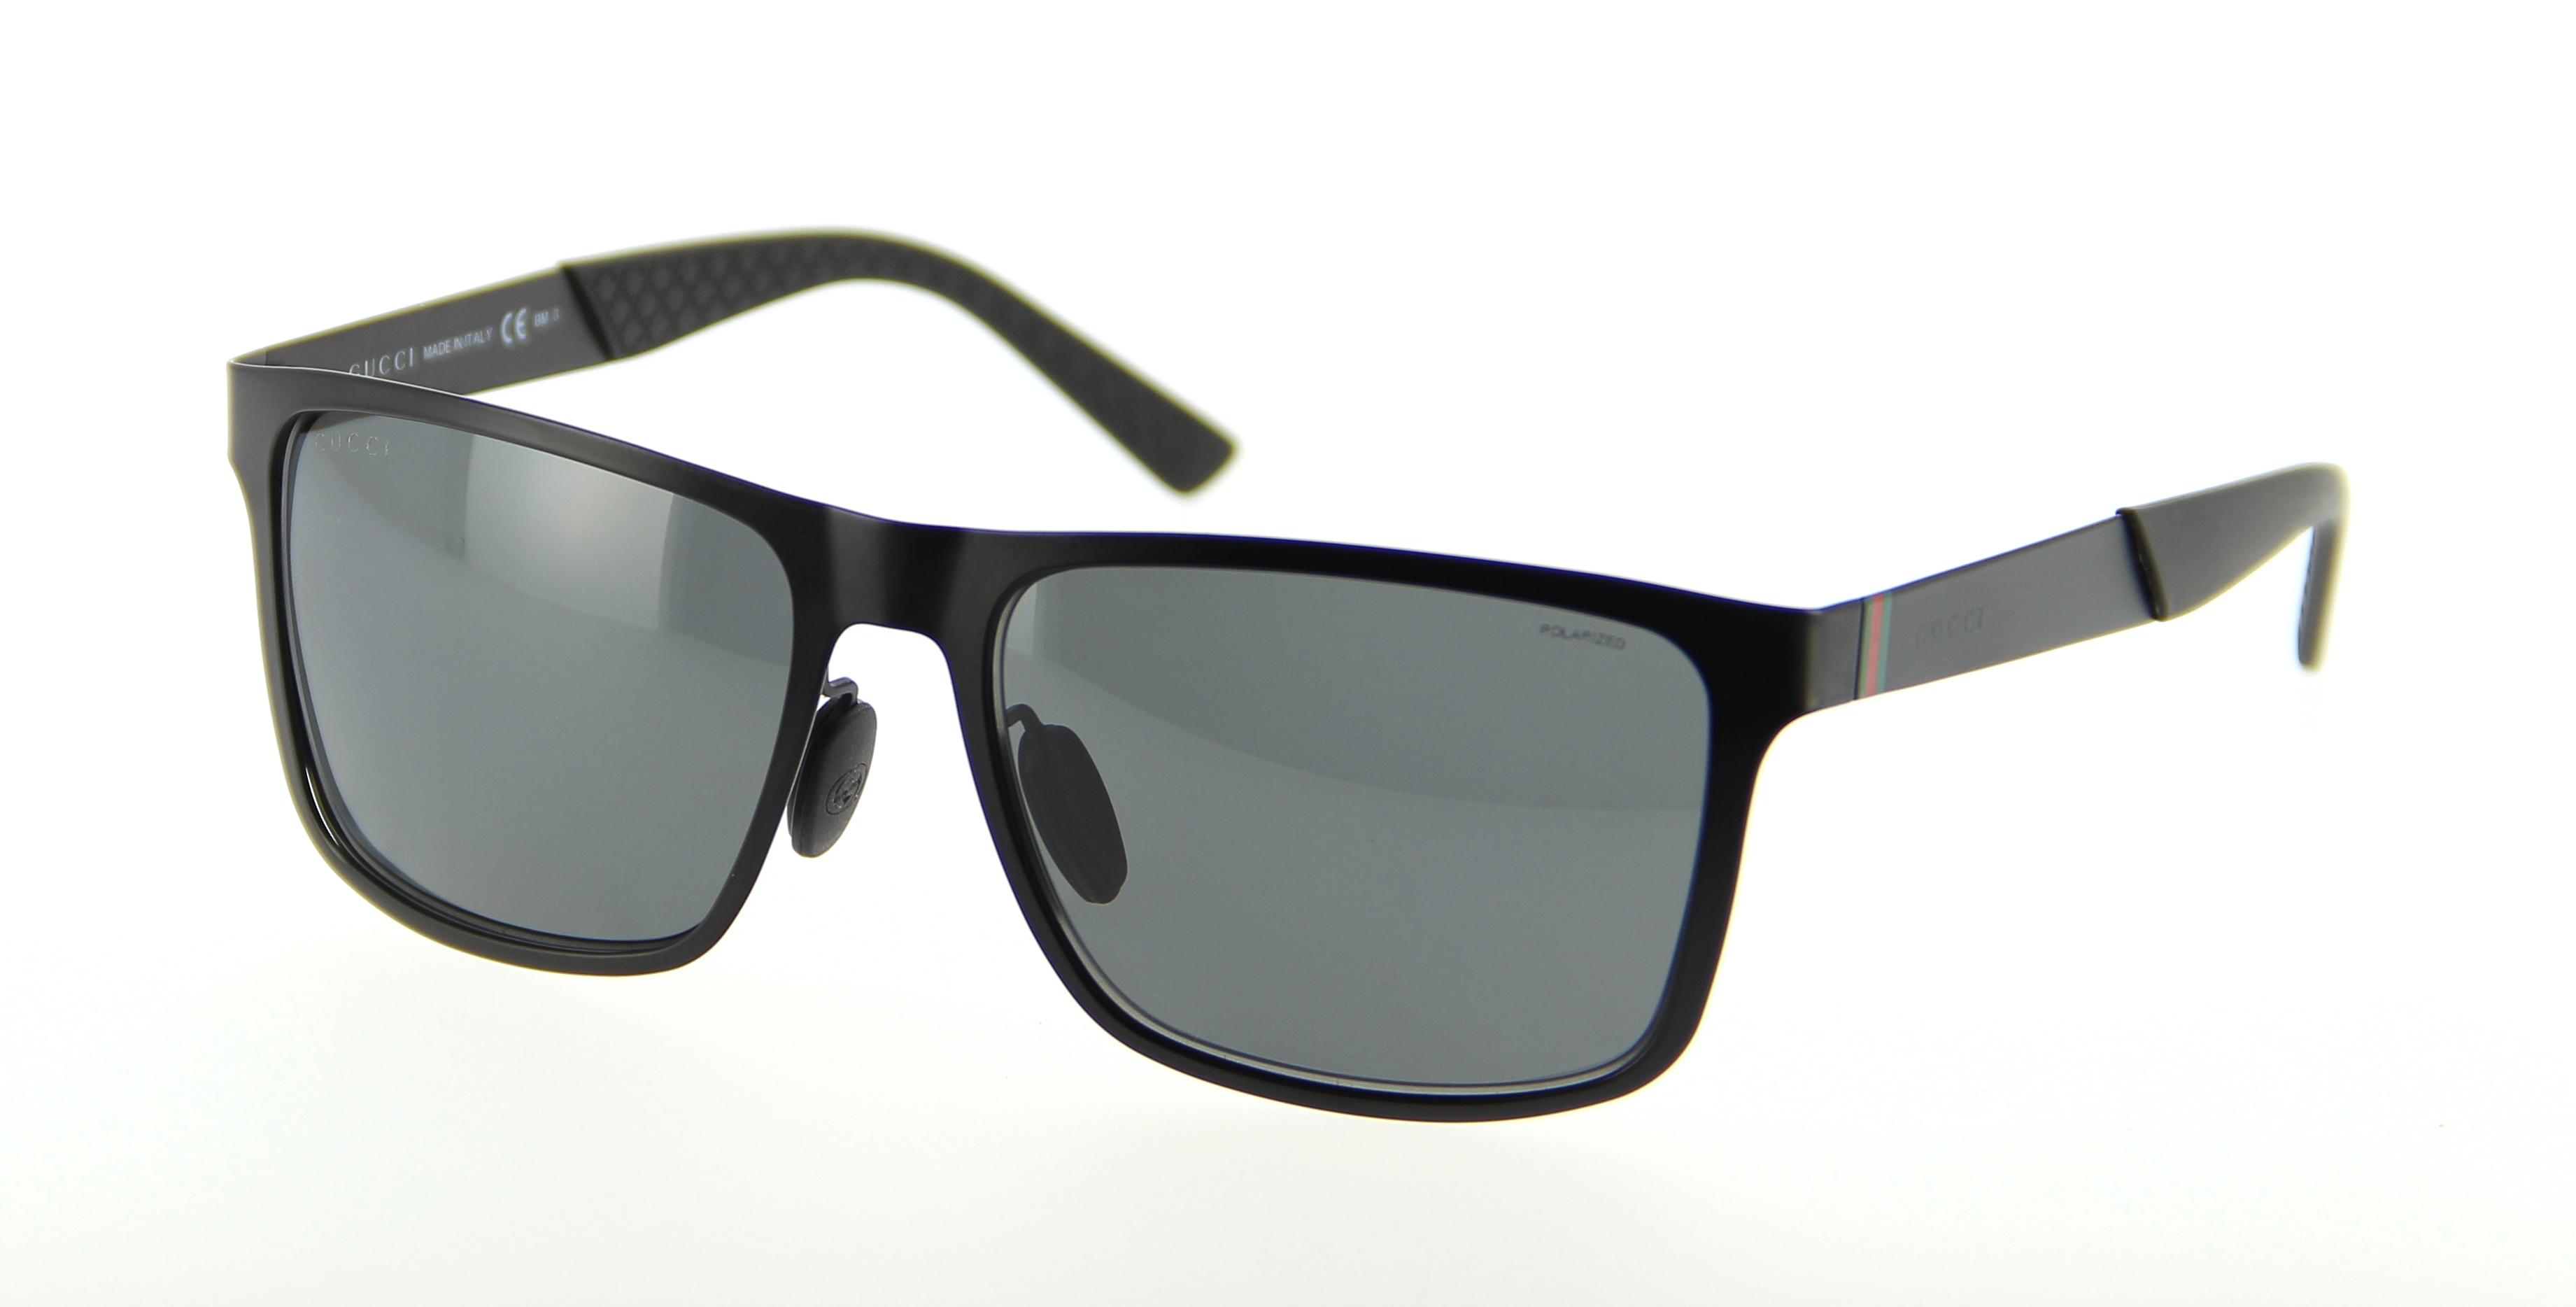 lunettes de soleil homme 2012 gucci. Black Bedroom Furniture Sets. Home Design Ideas